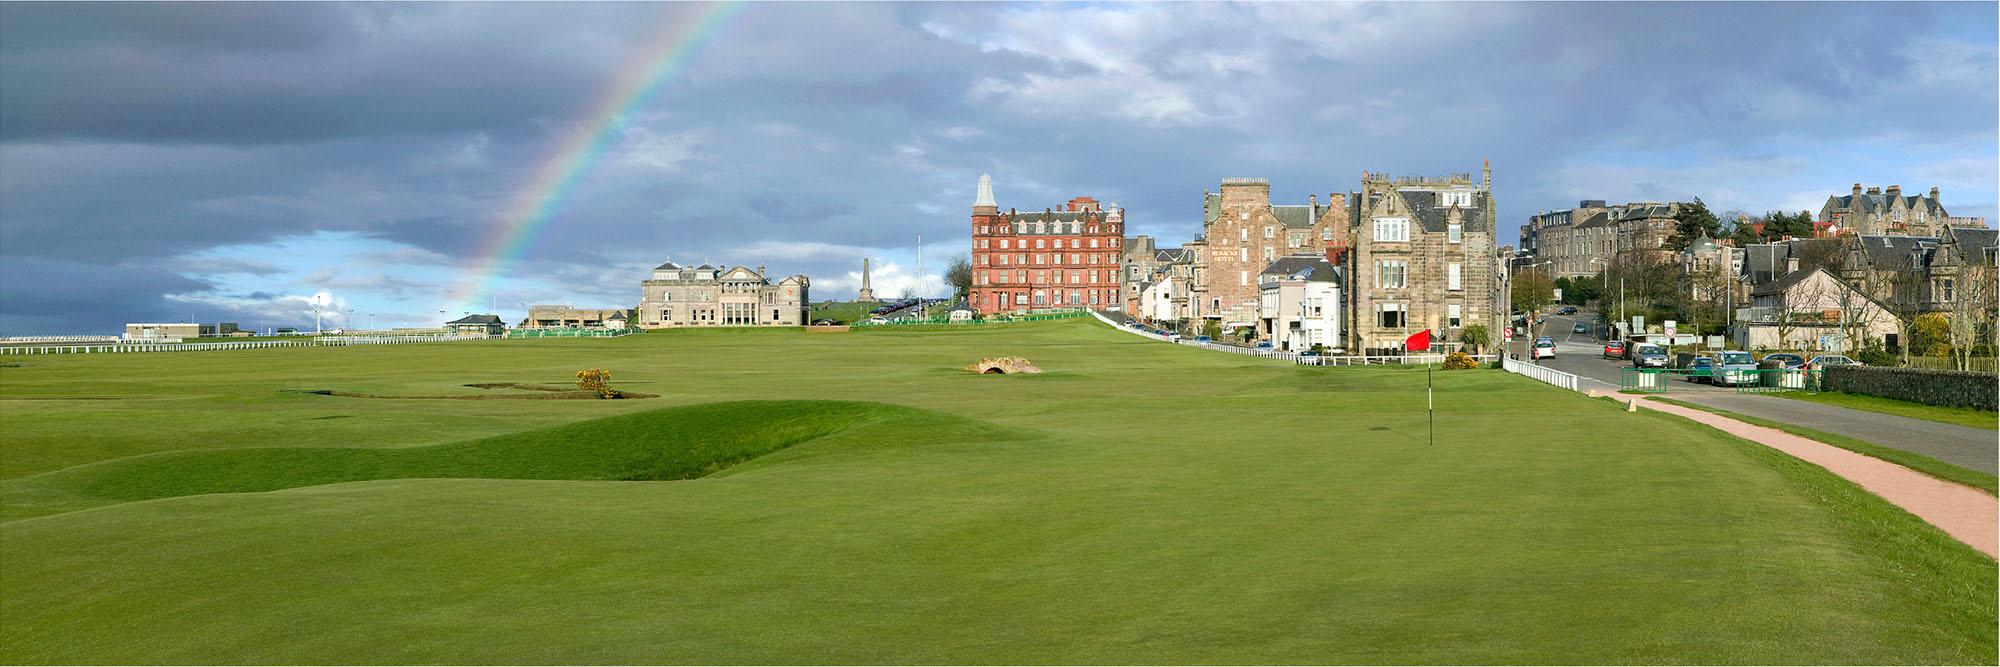 Golf Course Image - St Andrews No. 17 (Rainbow)